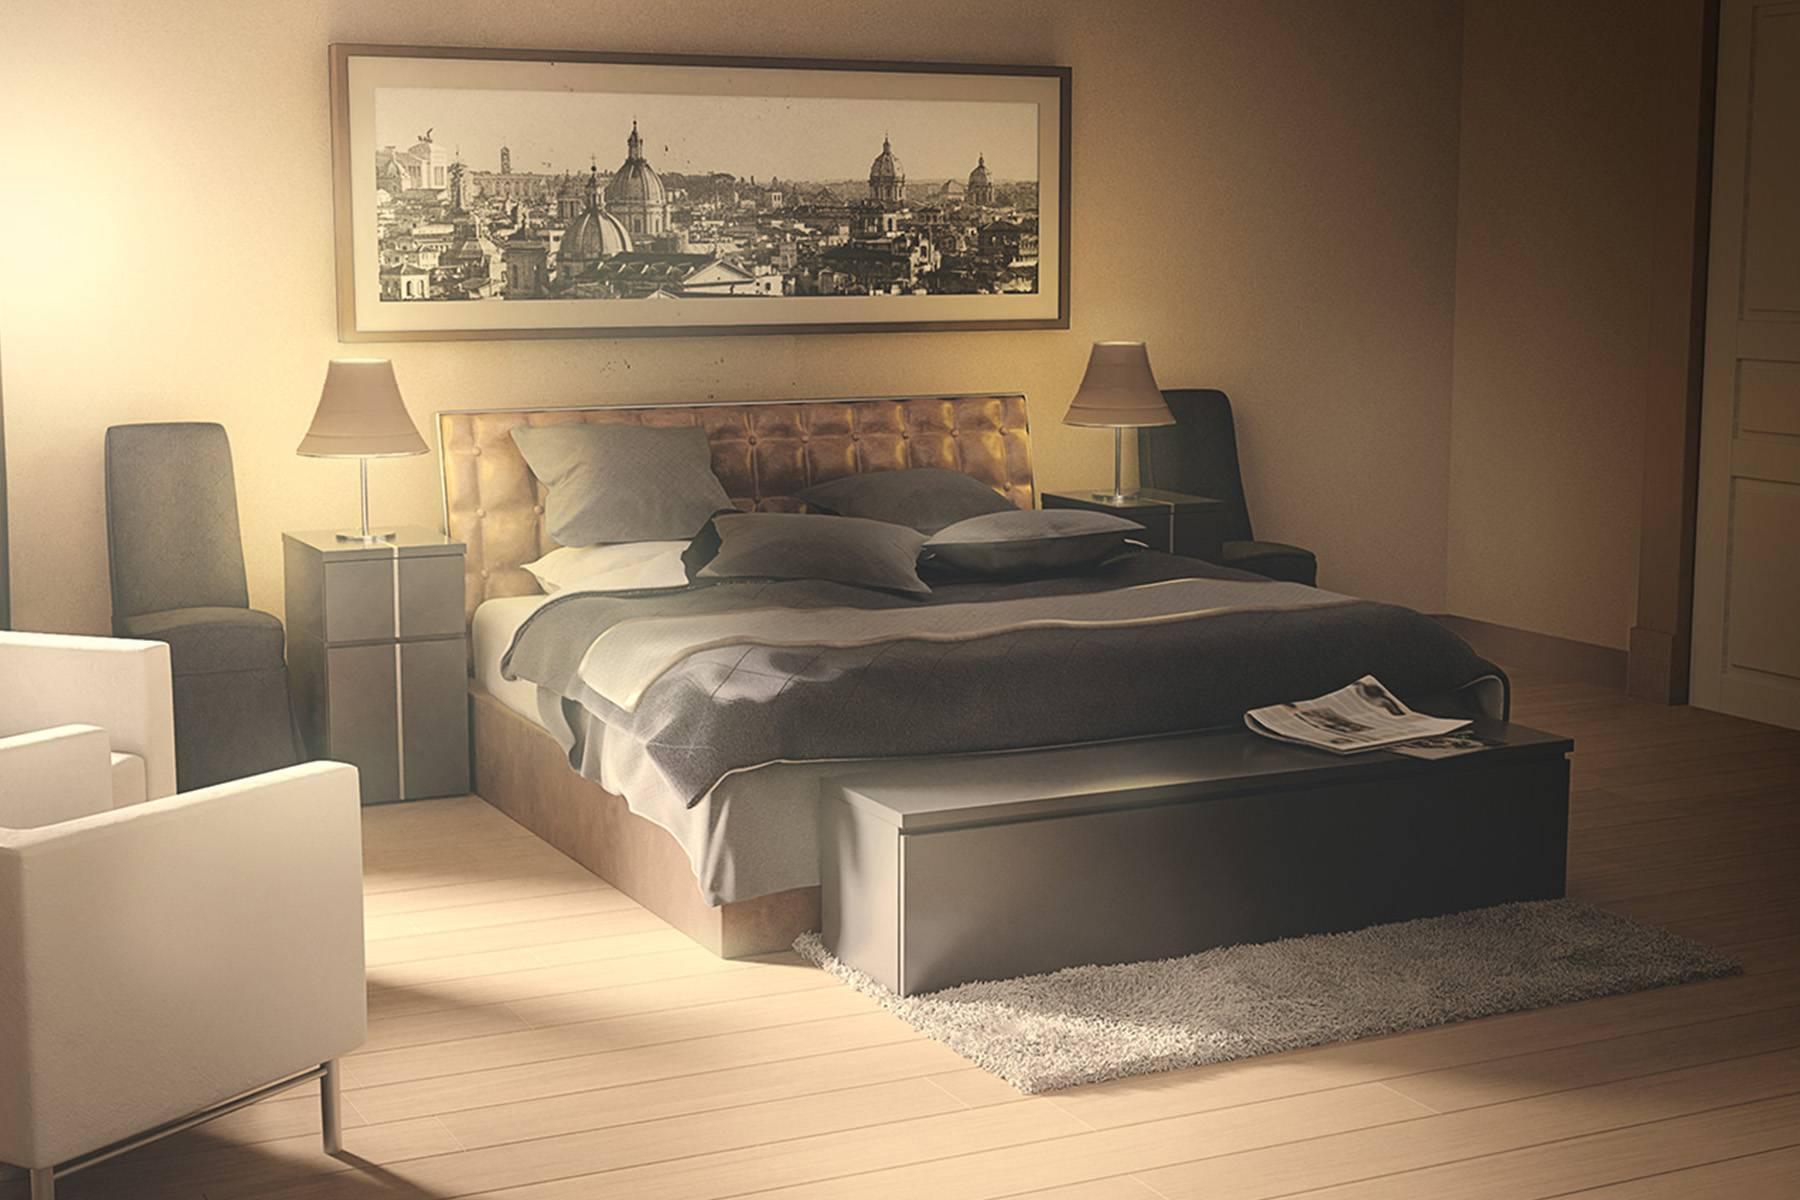 Spanish Steps luxury apartment - 7